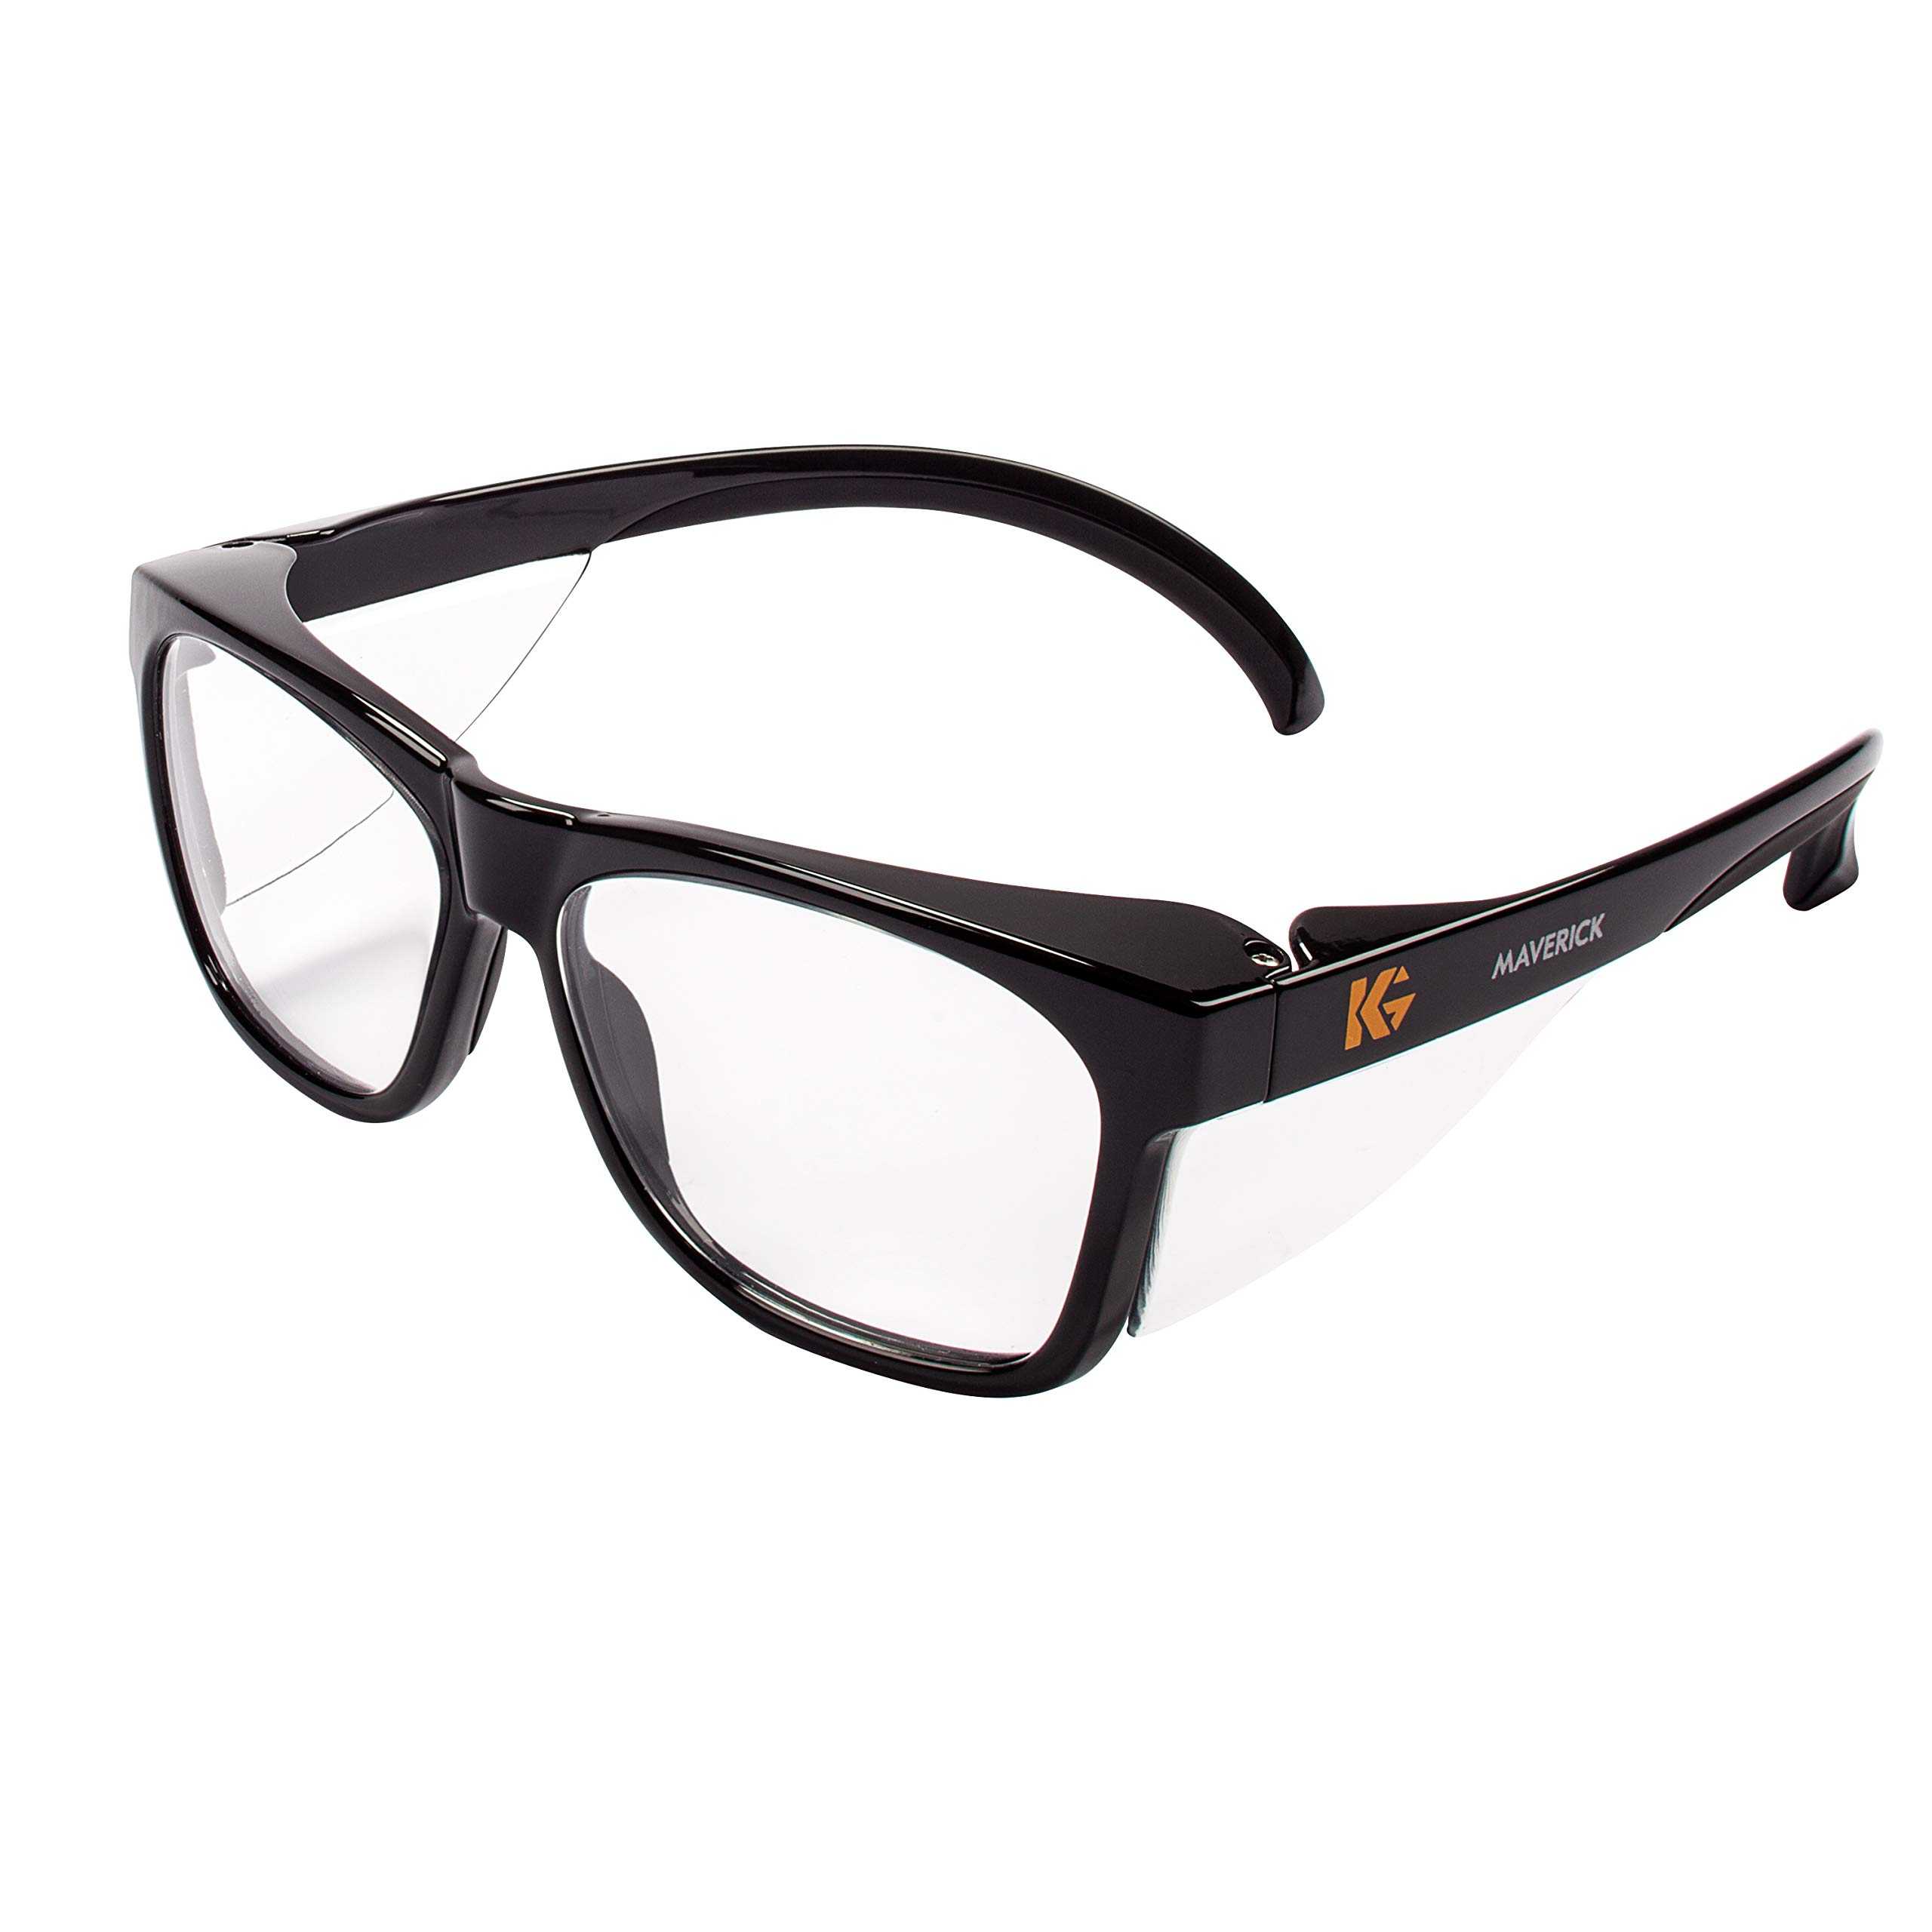 Kleenguard 49309 Maverick Safety Glasses, Black (Pack of 12) by KLEENGUARD